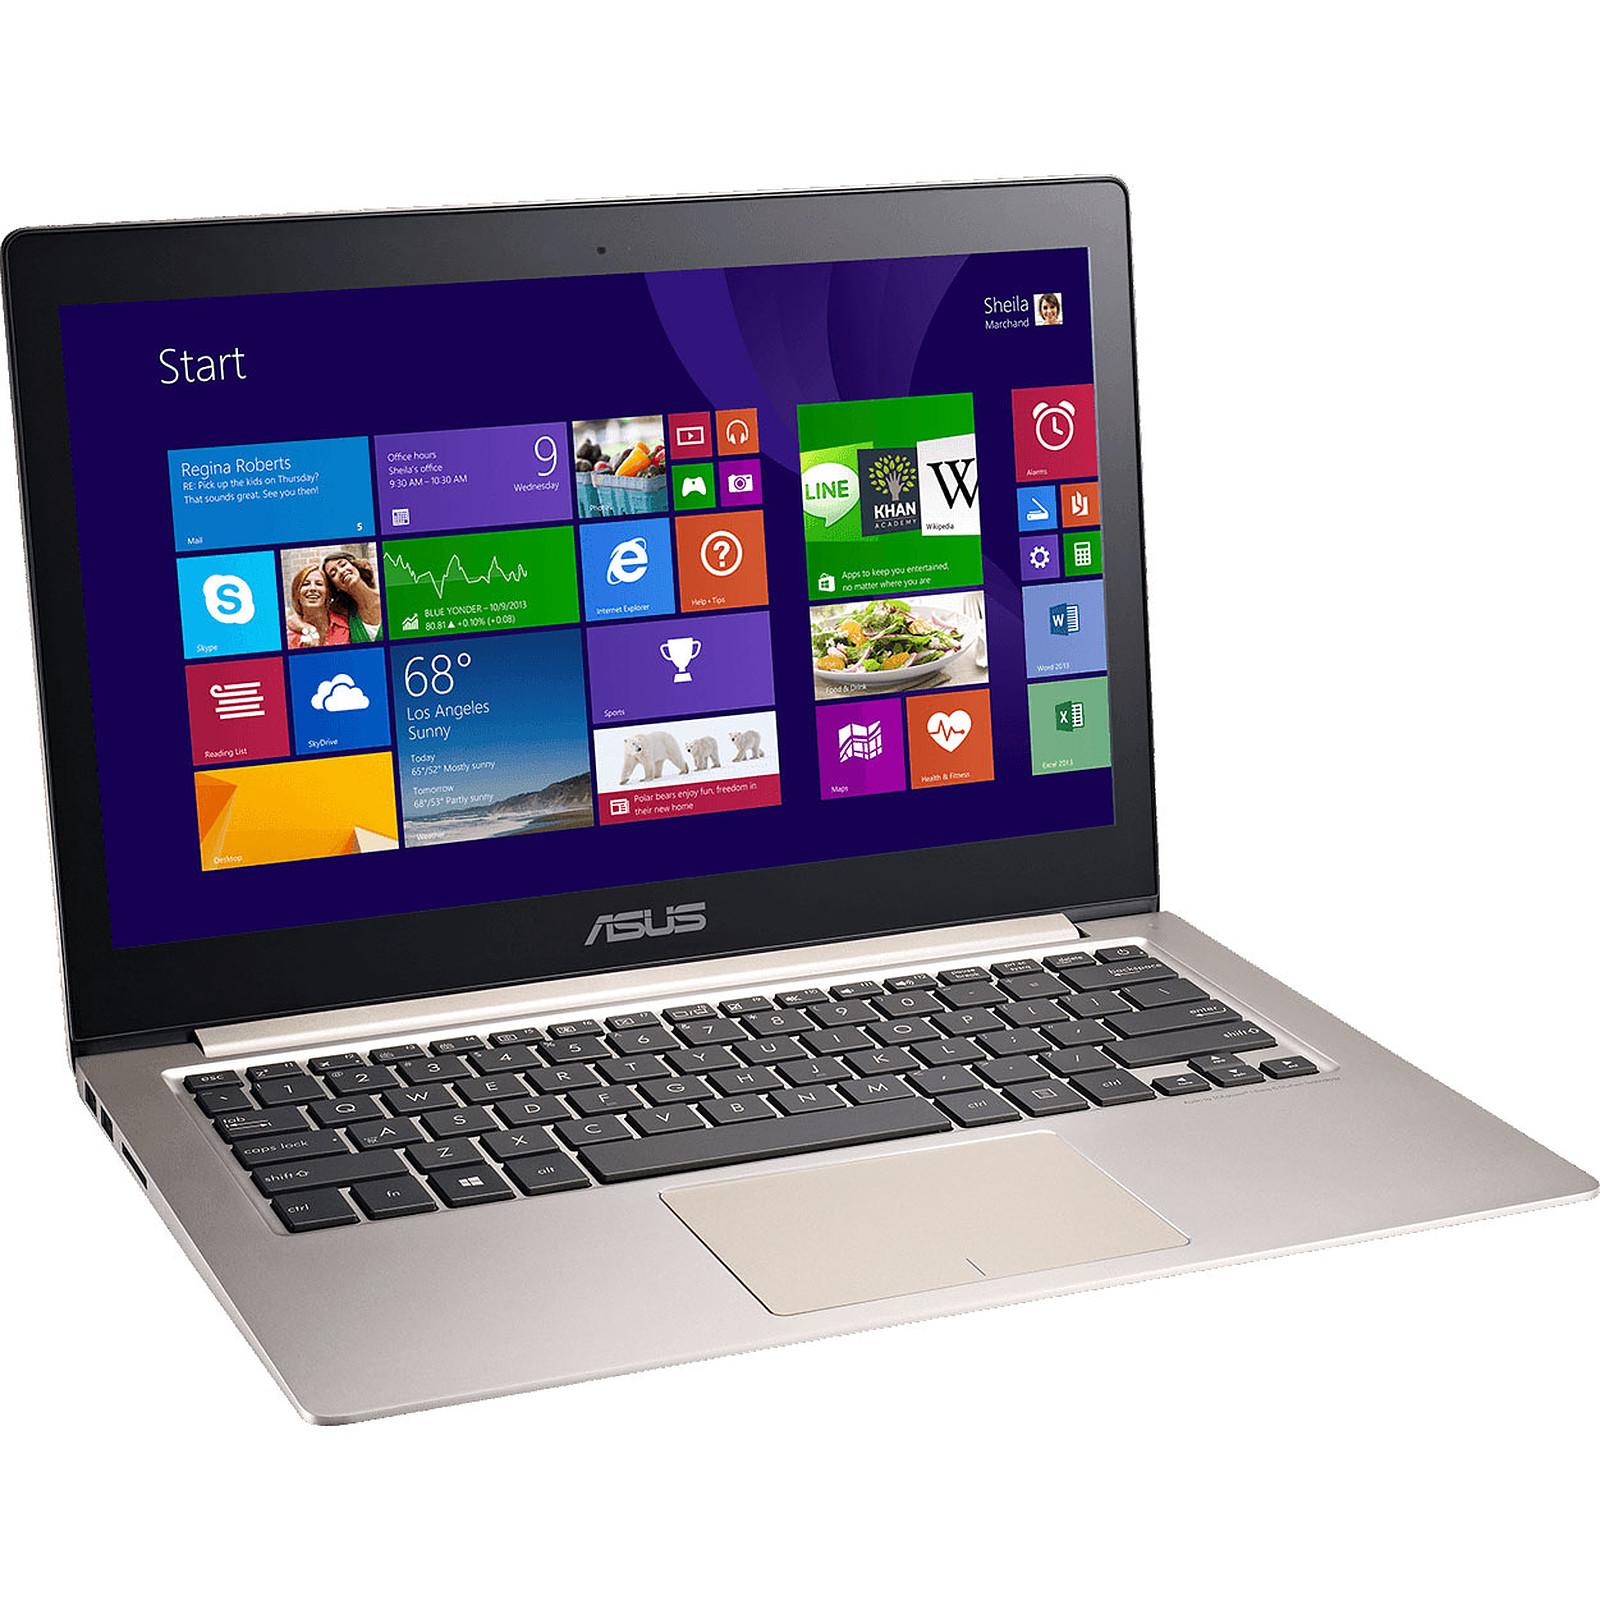 ASUS Zenbook UX303LA-R4425H